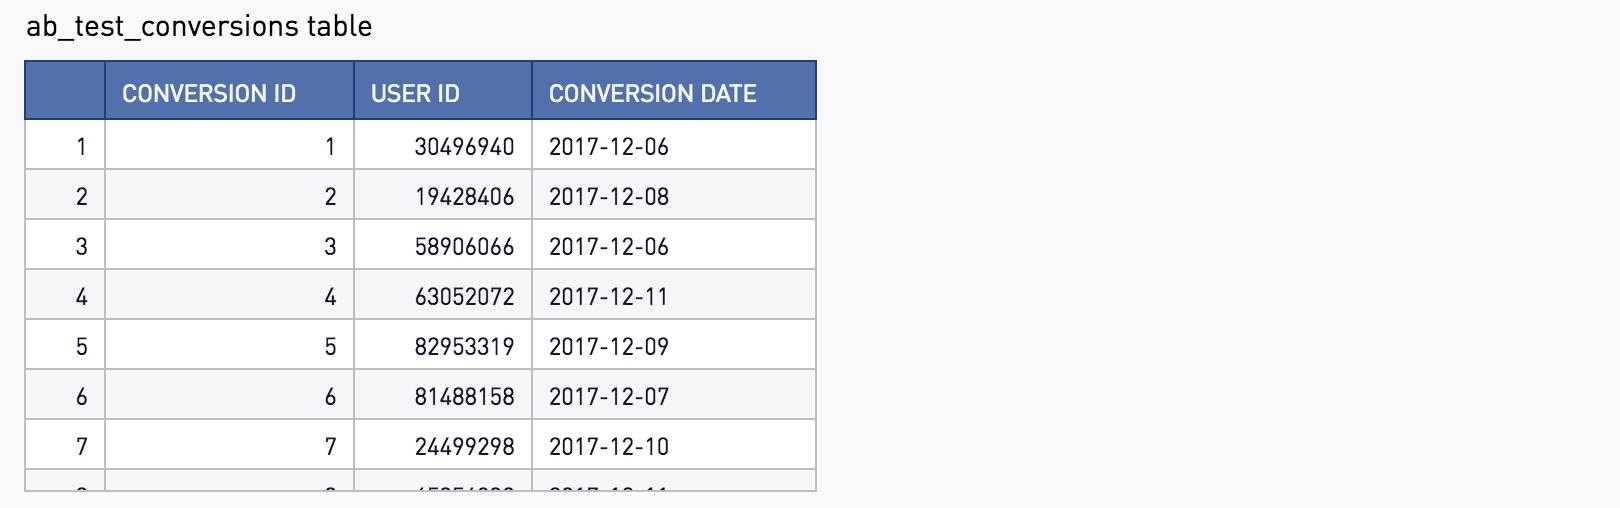 AB Test Conversions